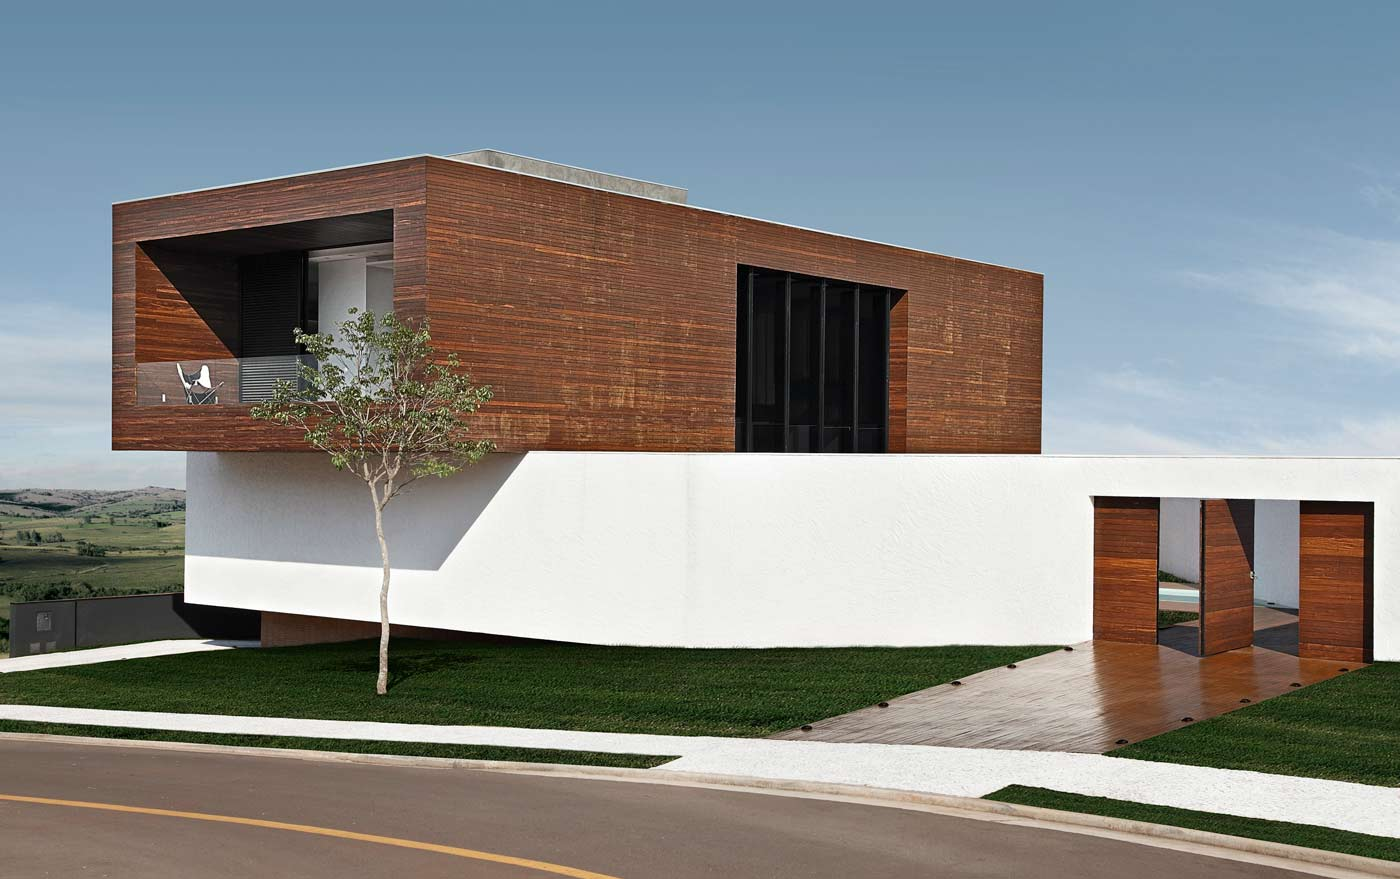 The-LA-House-by-Studio-Guilherme-Torres-4